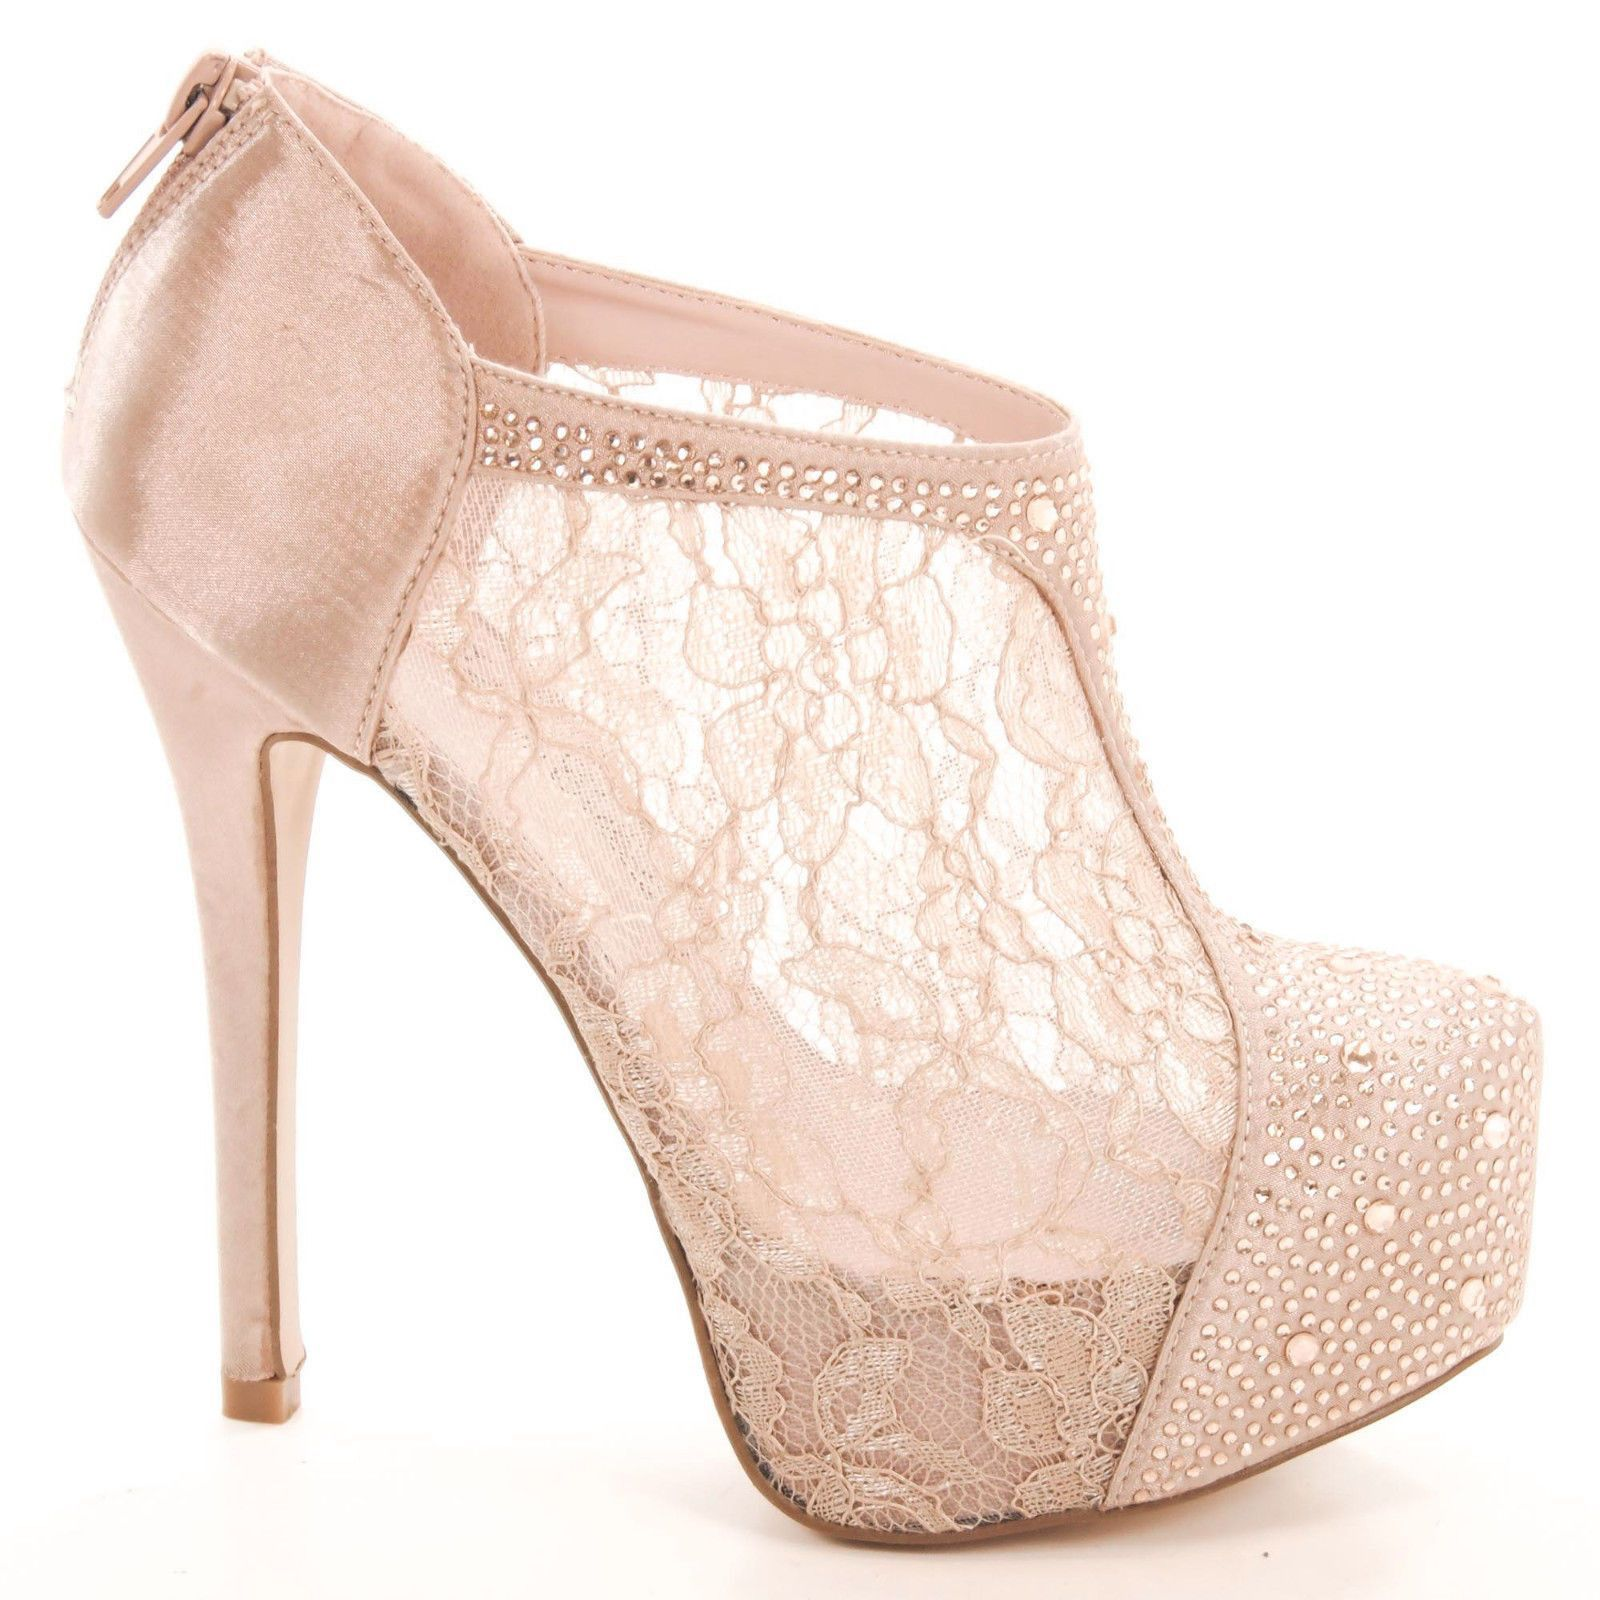 60ab04d2c5fd99 Nelson26 Lace Women Rhinestone Stiletto High Heel Platform Pump Ankle Bootie